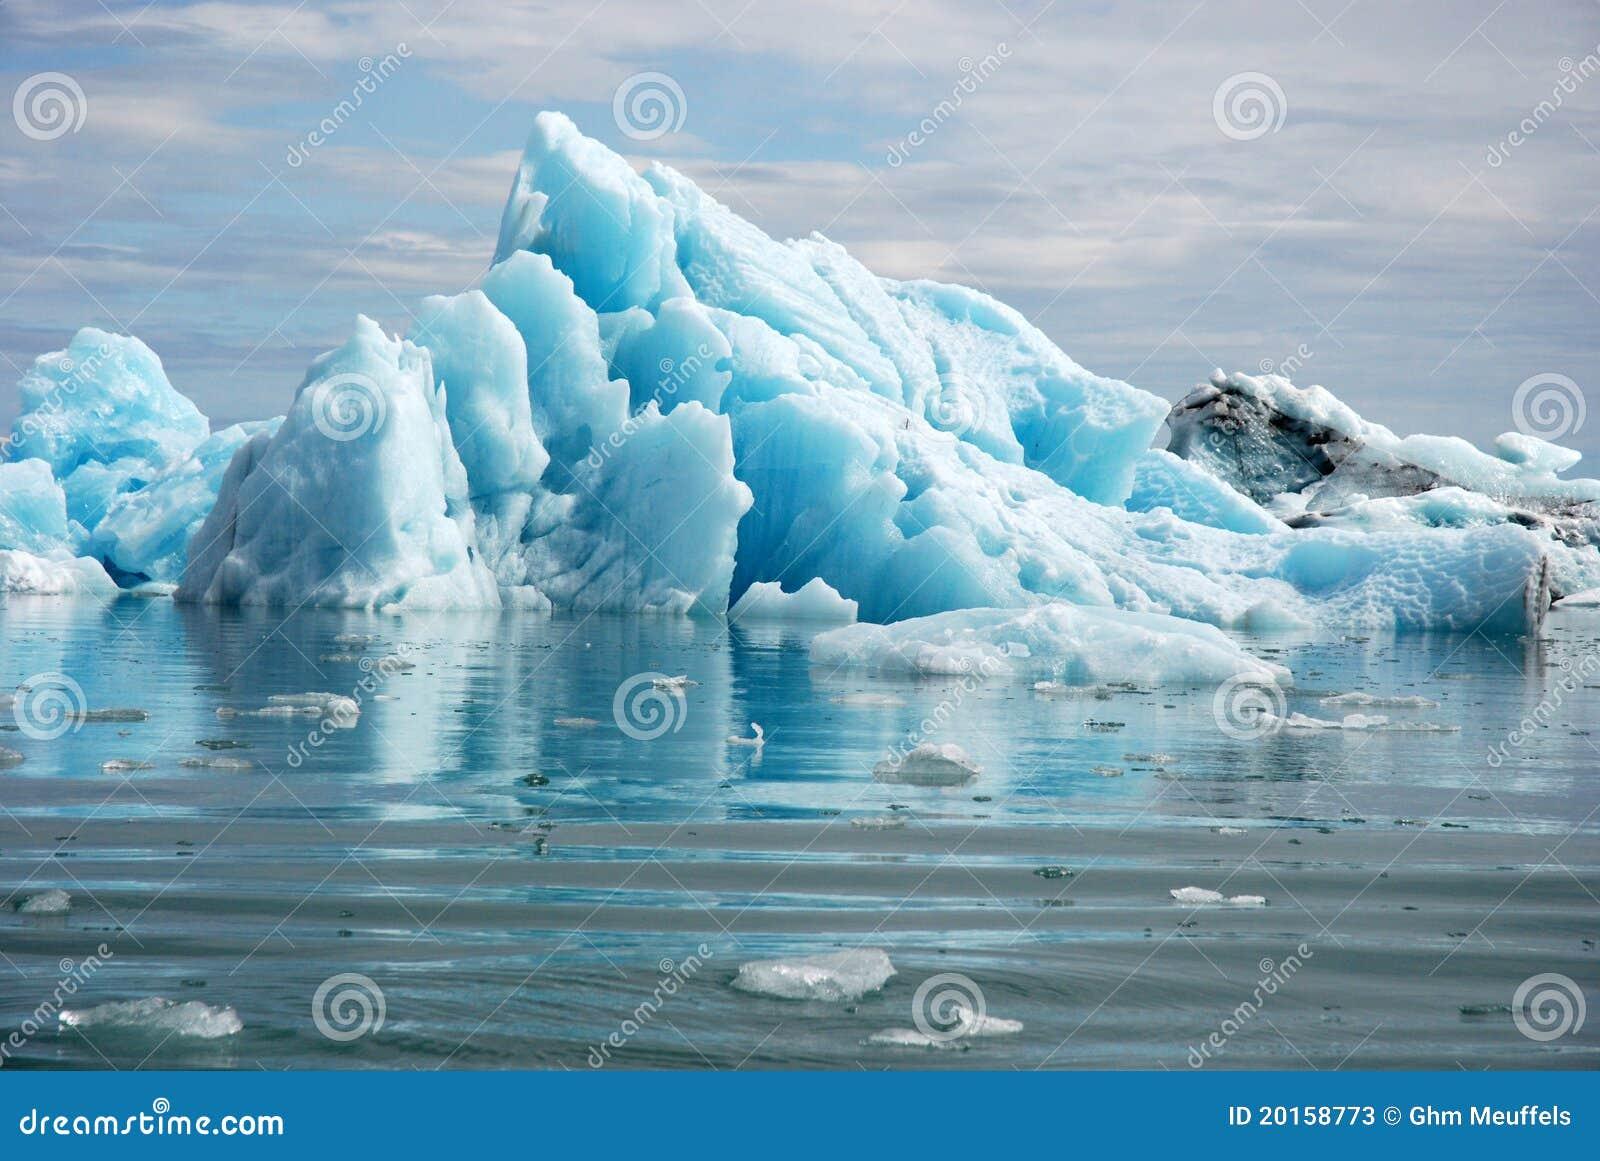 ³ azul n lagoa-Islândia do rlà do ¡ do gelo-Jökulsà da geleira